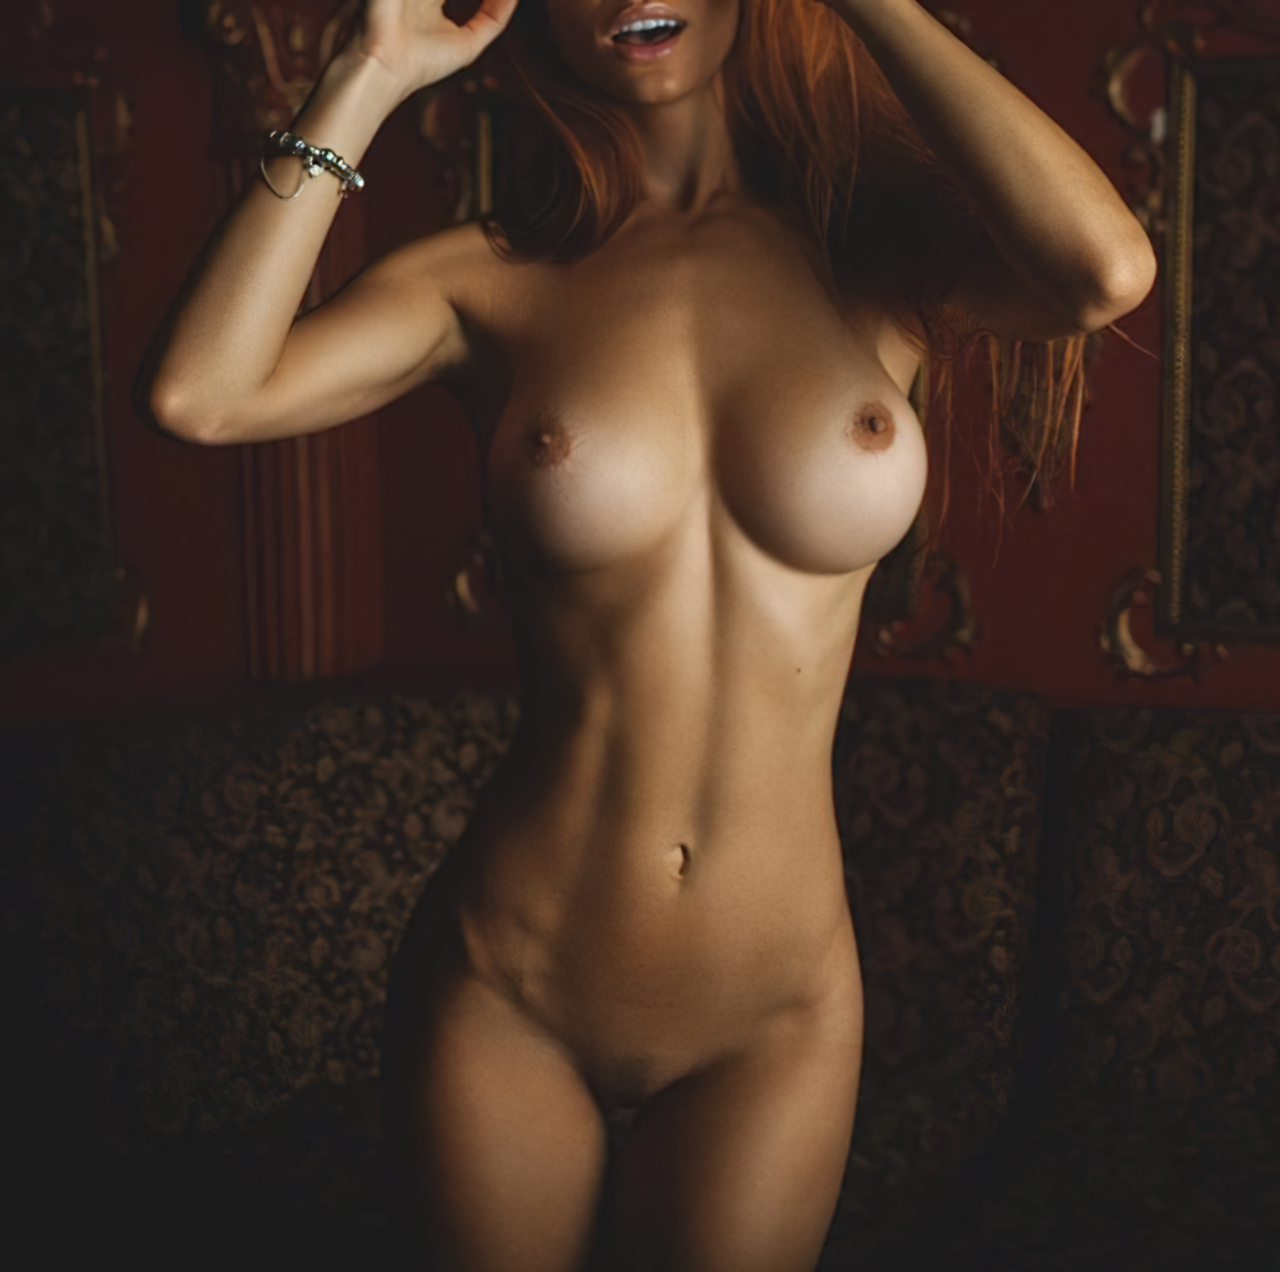 Mulheres Safadas (21)